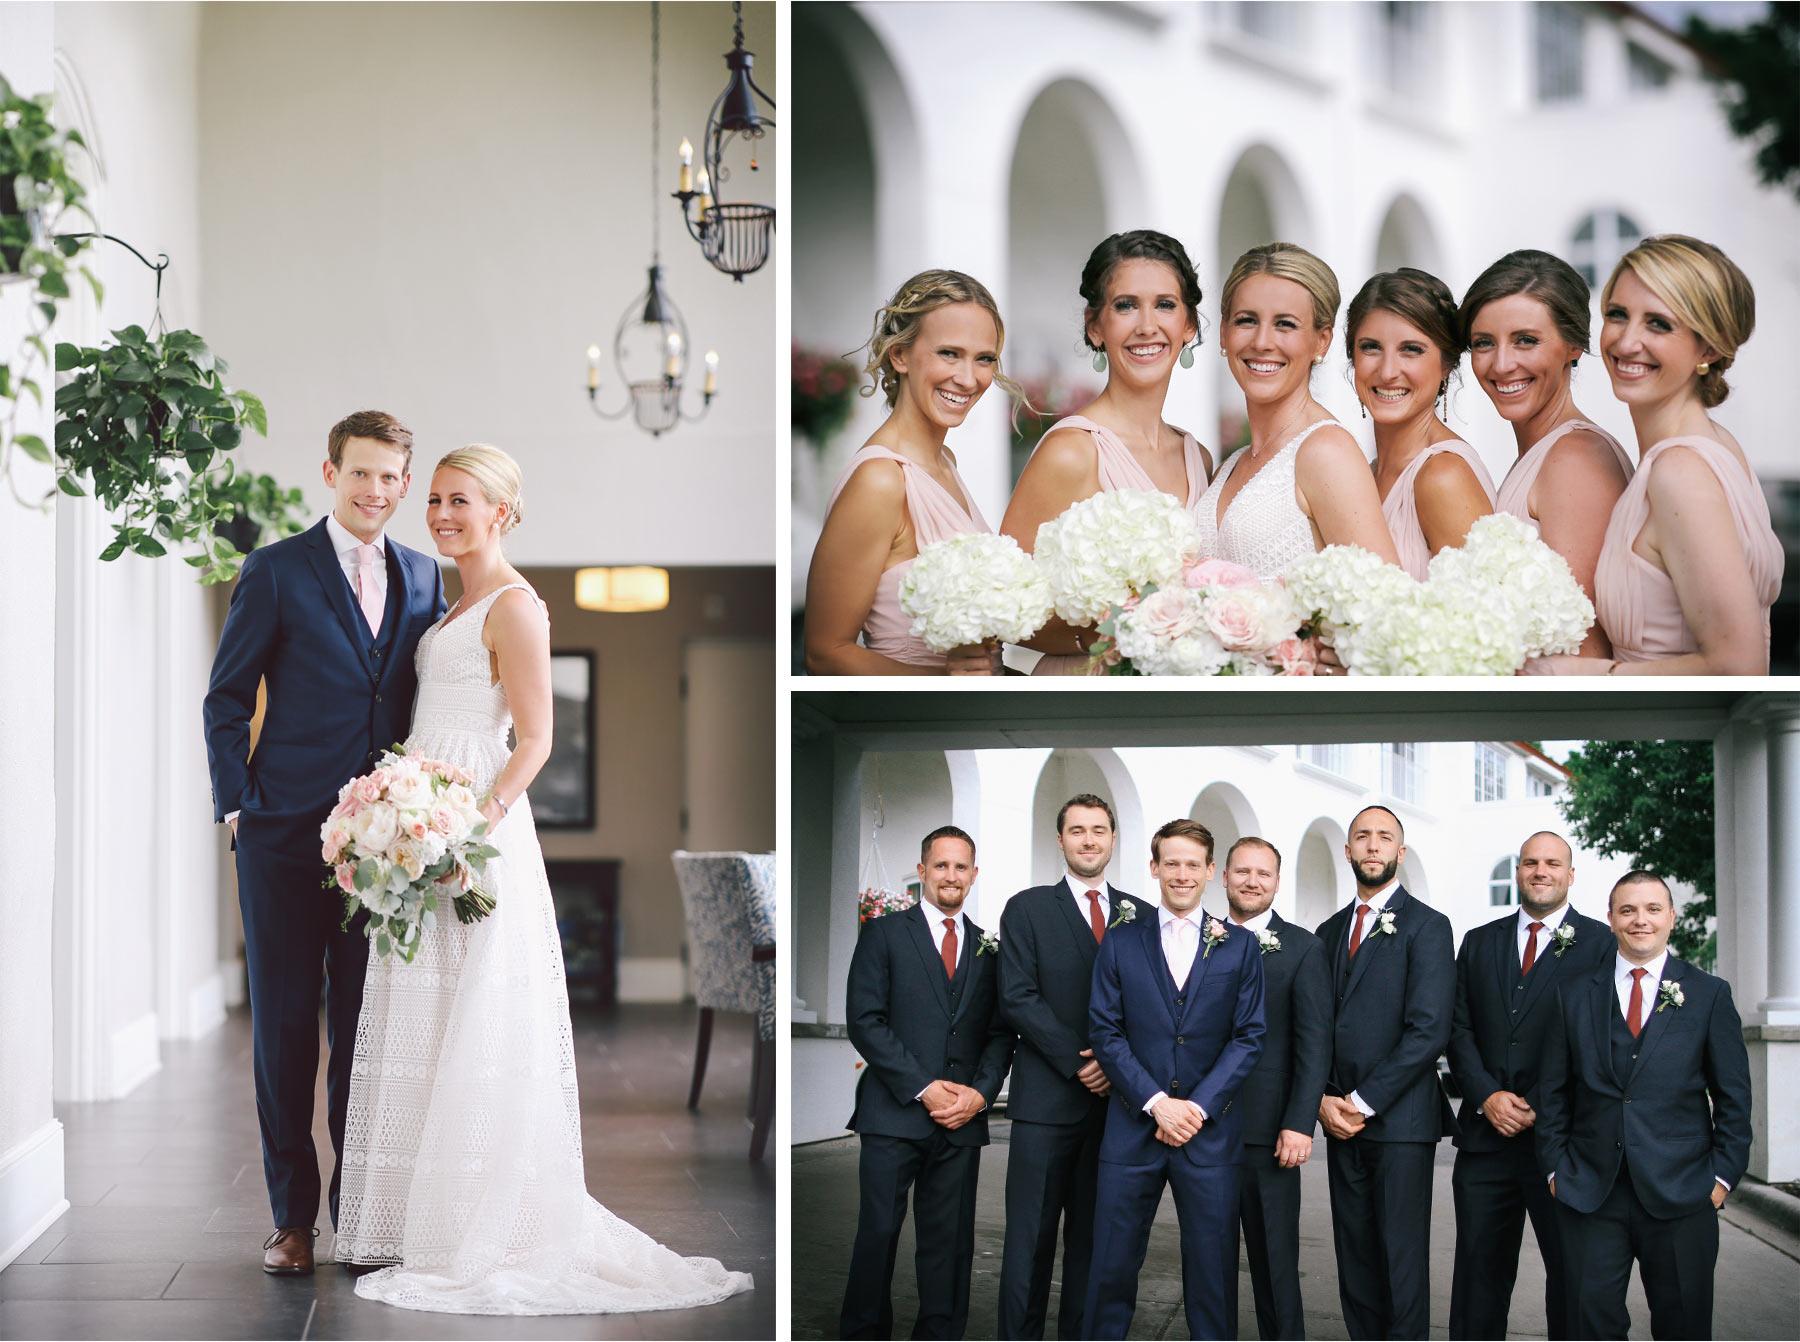 07-Minneapolis-Minnesota-Wedding-Photography-by-Vick-Photography-Lafayette-Club-Maggie-and-Nicholas.jpg